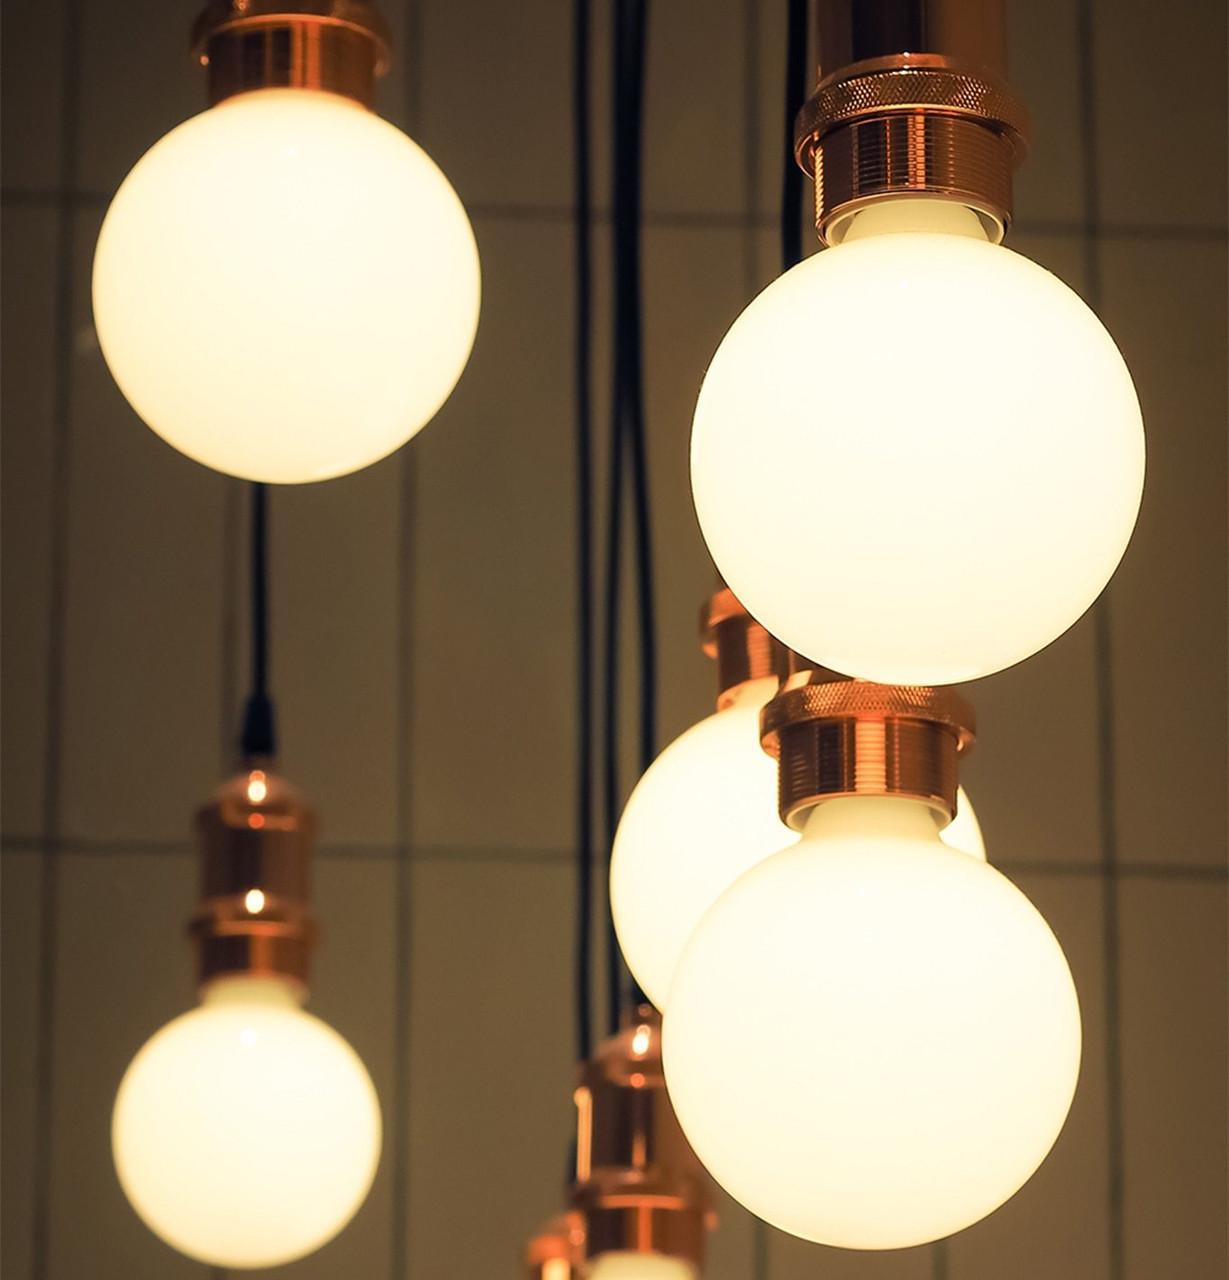 LED G125 ES-E27 Light Bulbs